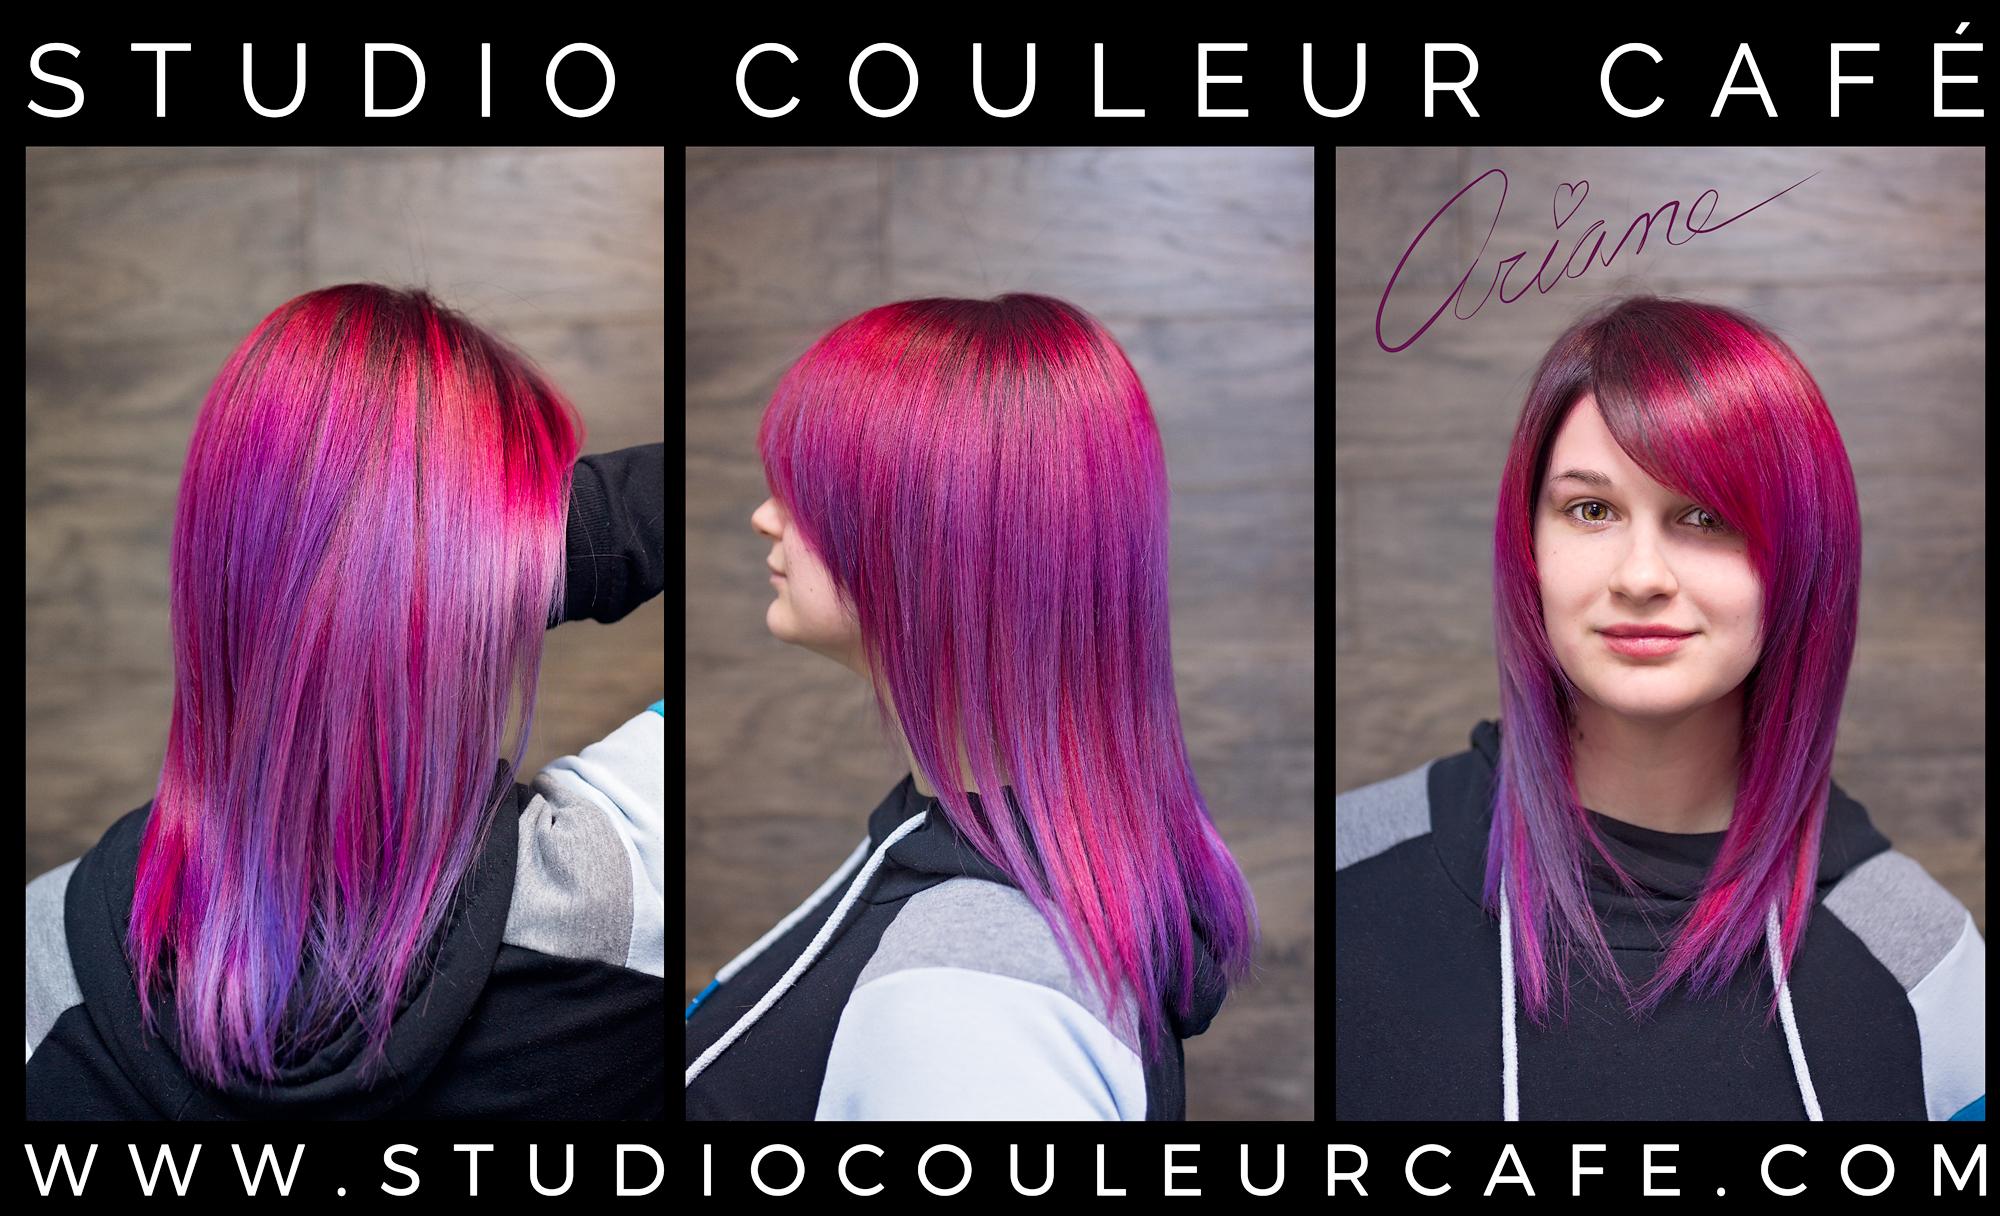 spotted meilleur coiffeuse couleur